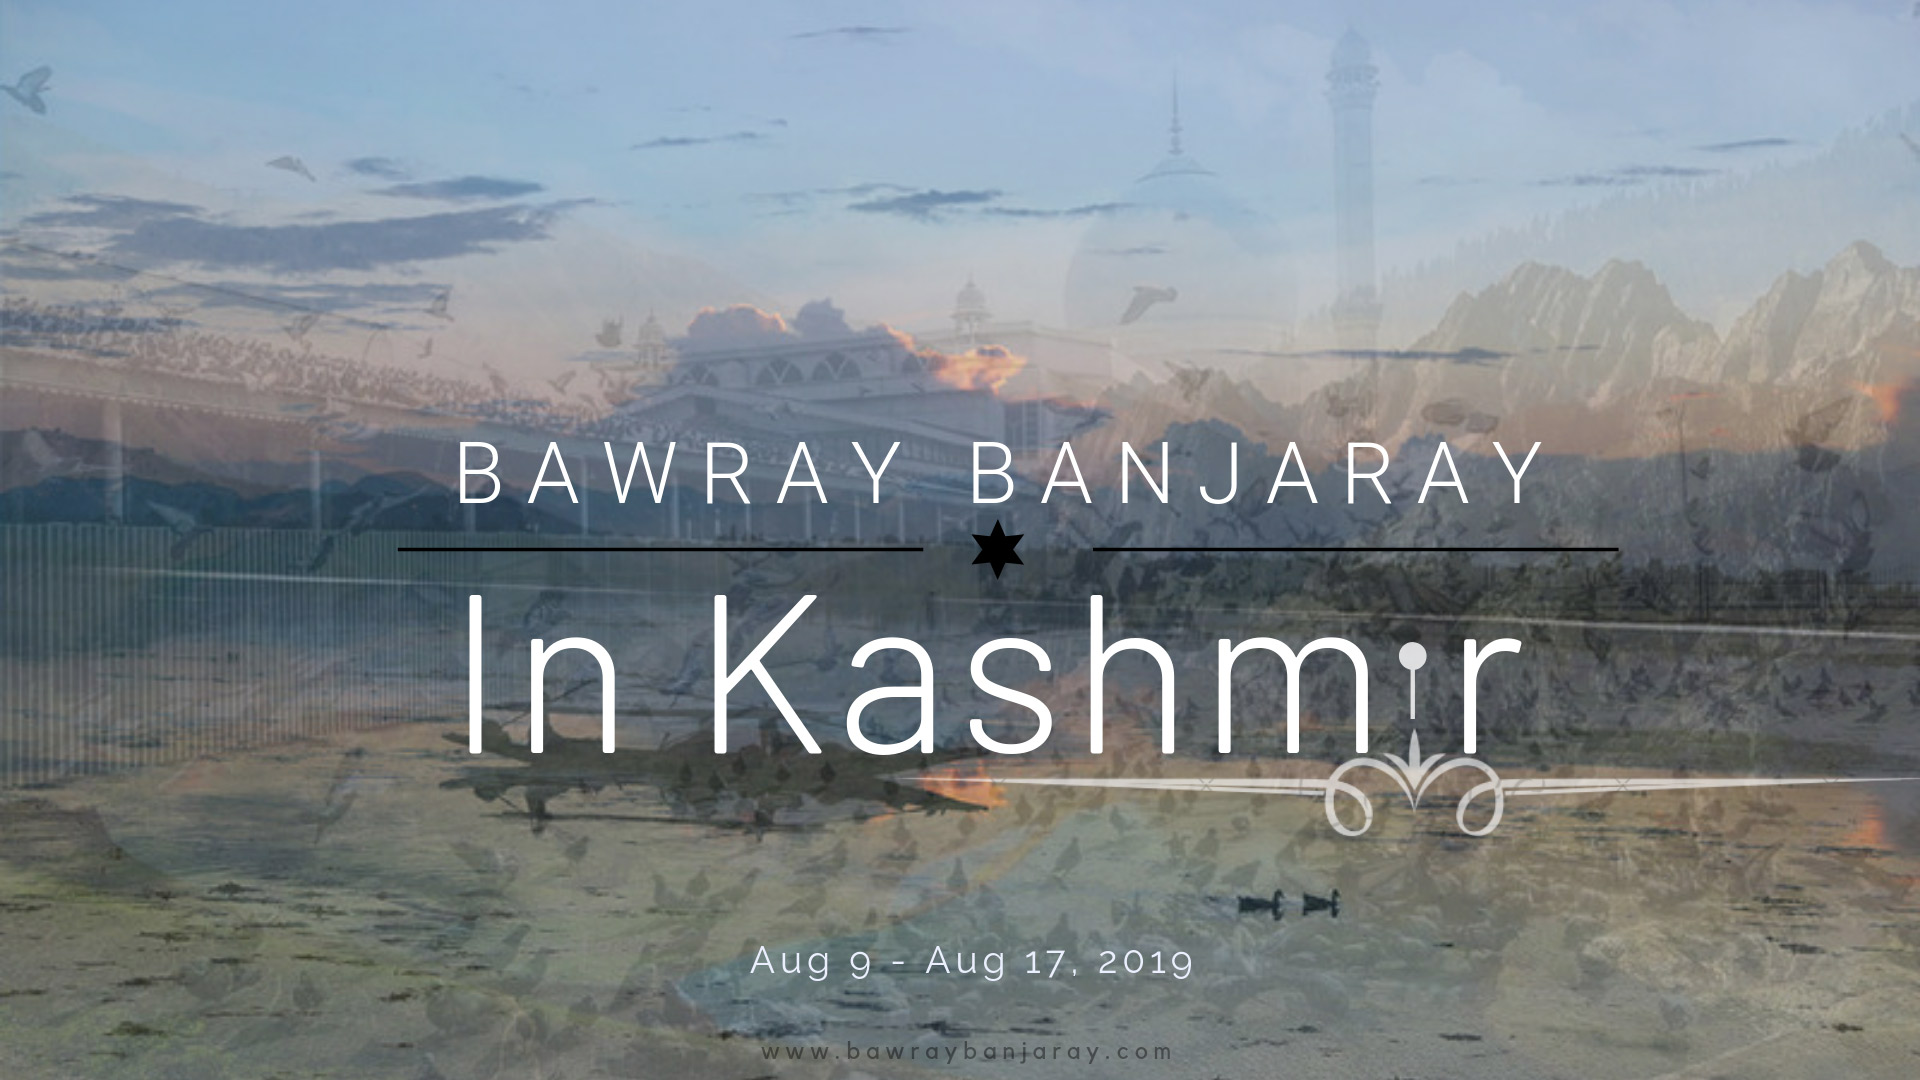 Bawray Banjaray In Kashmir Poster